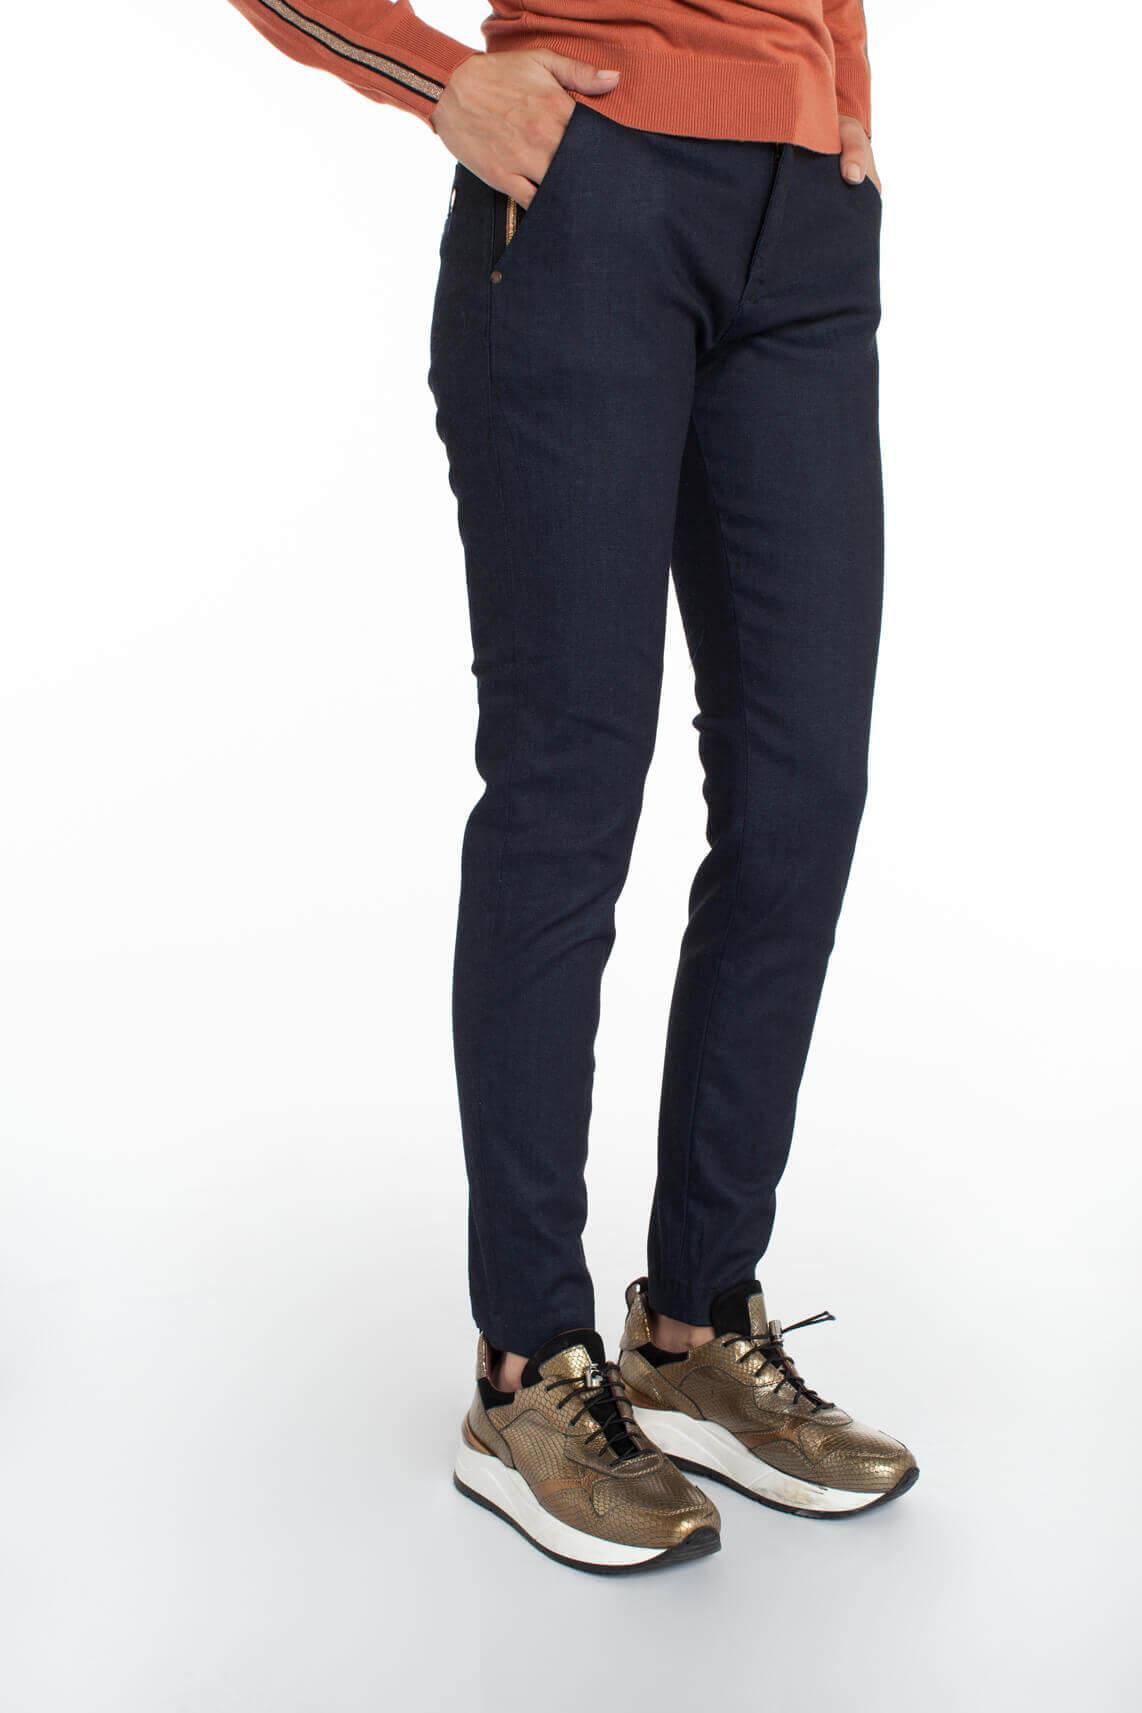 Mos Mosh Dames Gallery pantalon Blauw